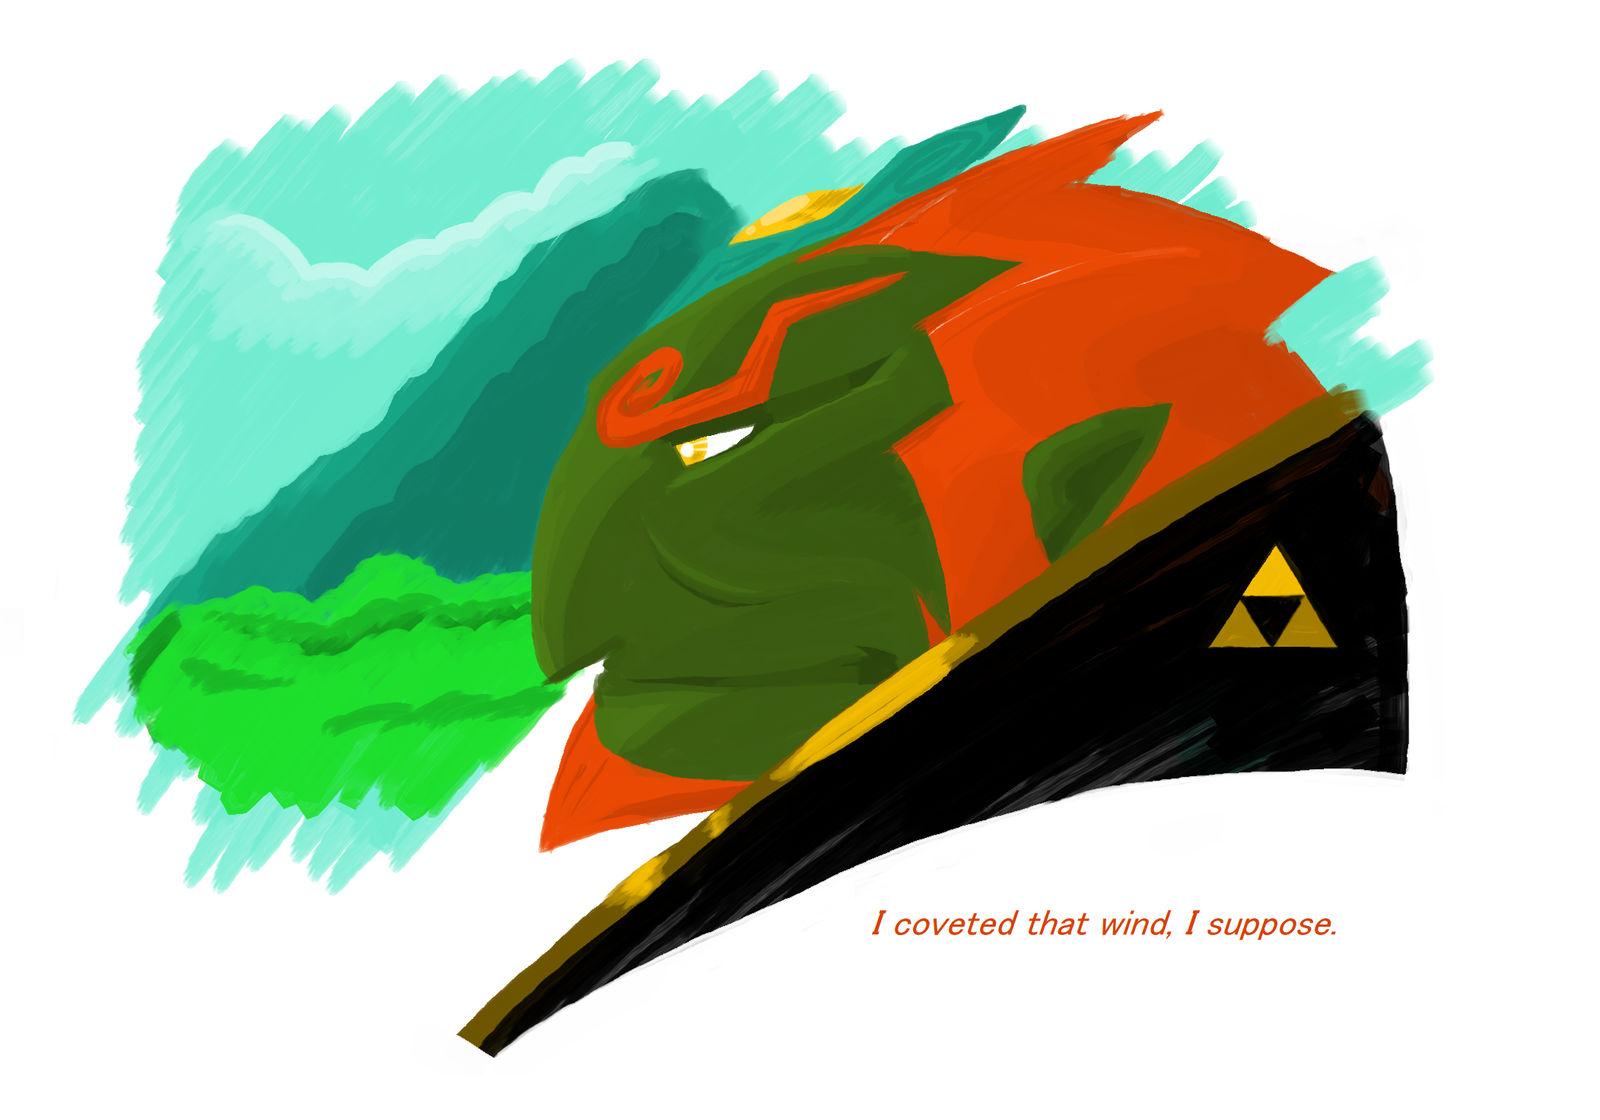 Ganondorf Dragmire Wind Waker By Mariiboops On Deviantart